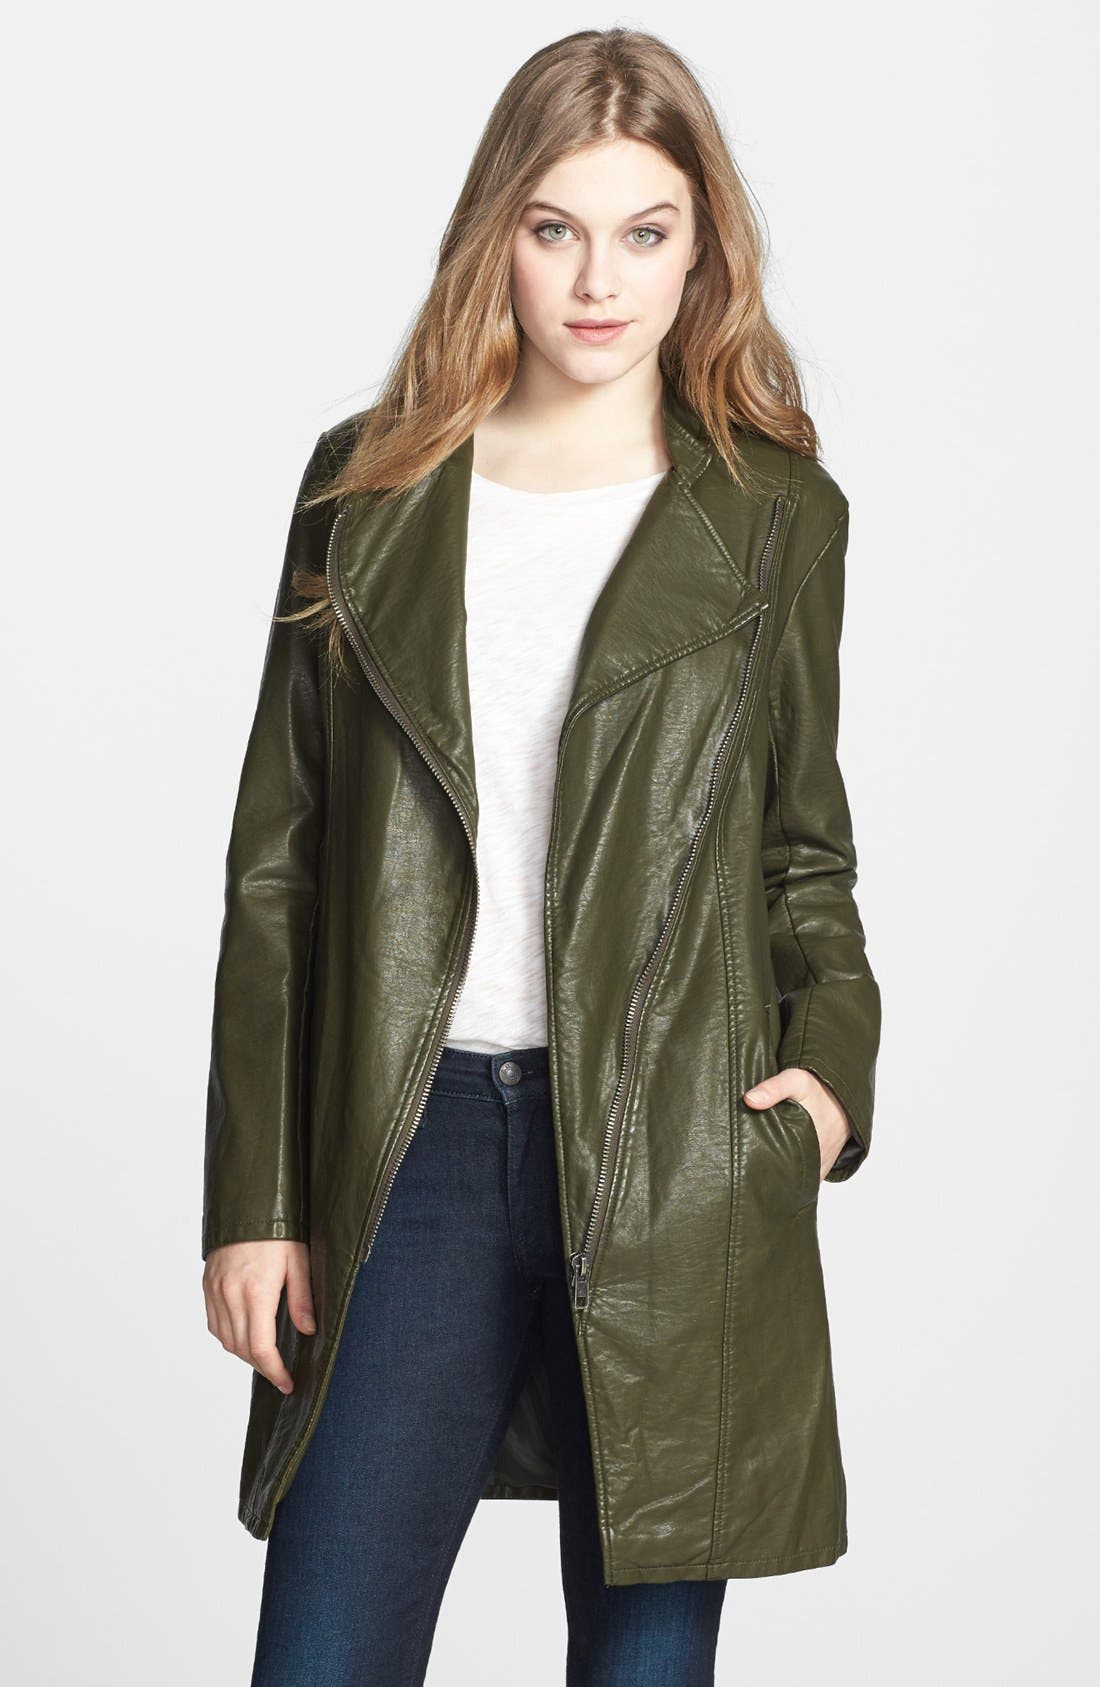 Alternate Image 1 Selected - BB Dakota 'Eureka' Faux Leather Long Coat